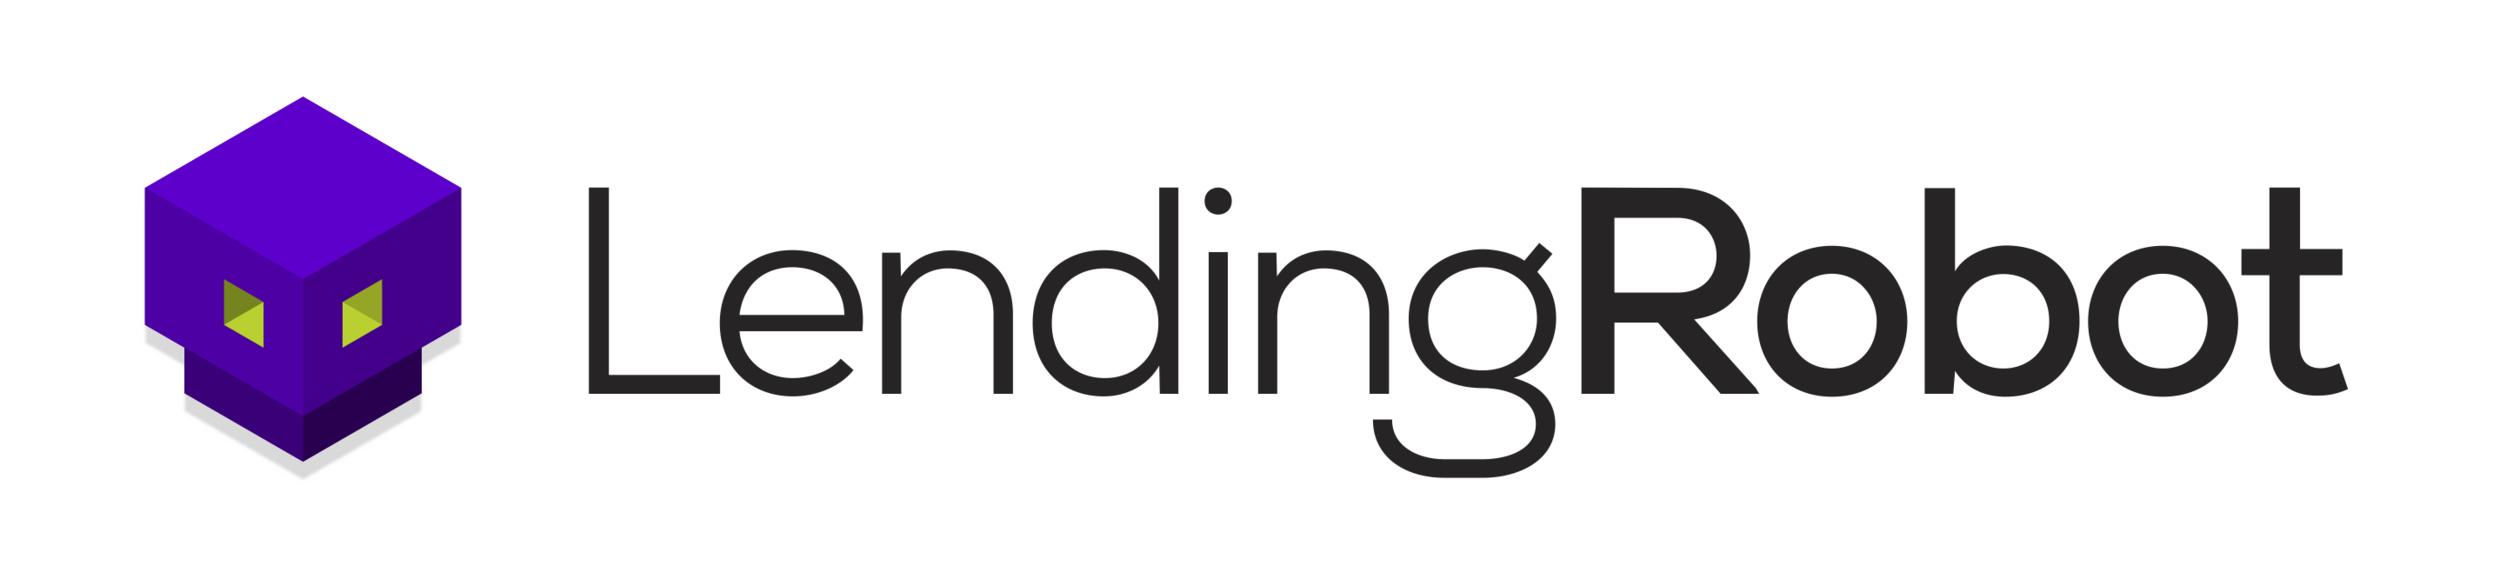 LendingRobot-Logo.png